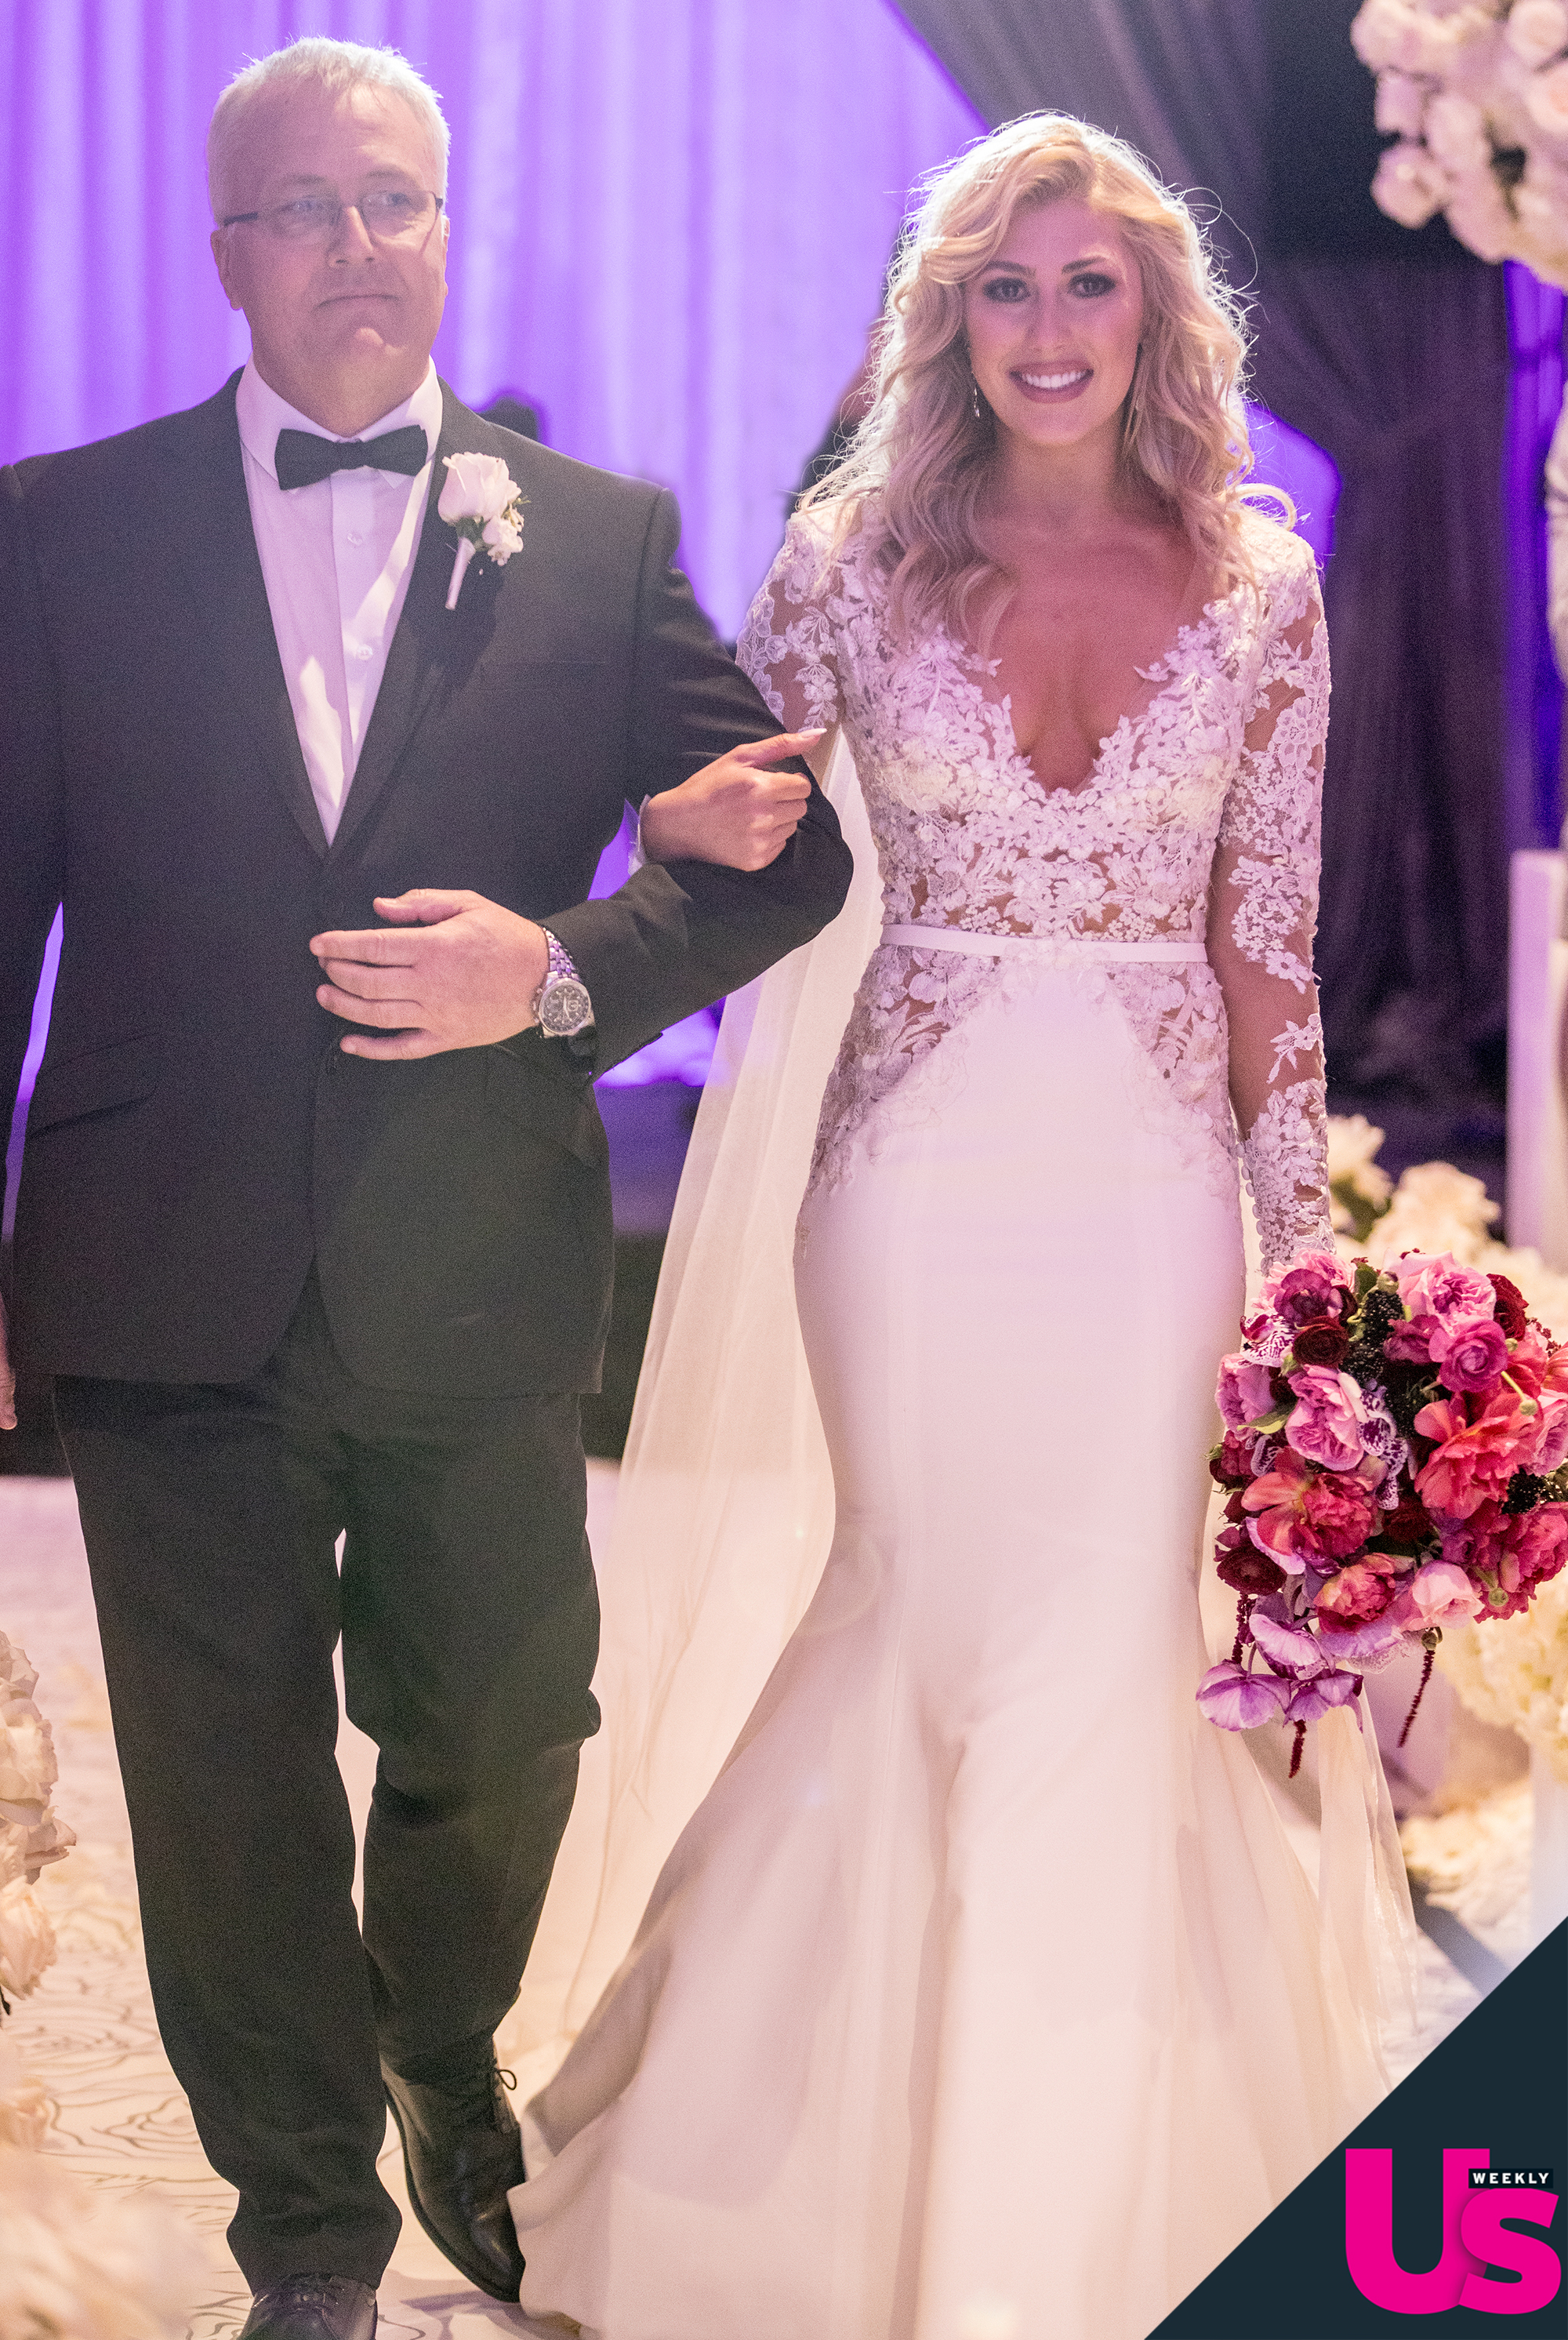 DWTS\' Pros Emma Slater and Sasha Farber\'s Wedding Album